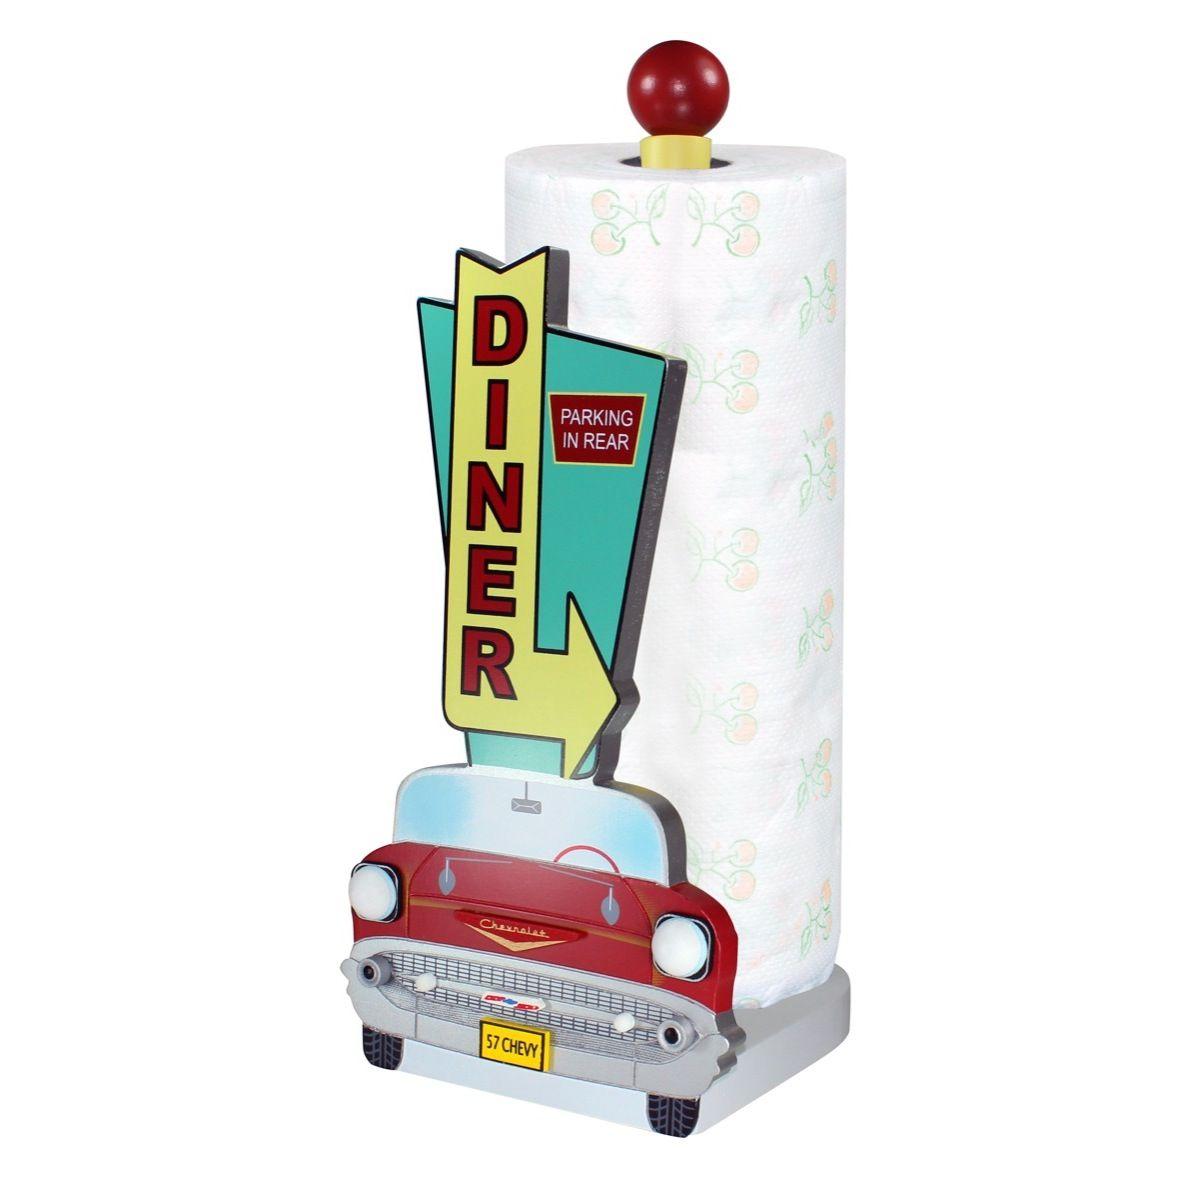 1957 Bel Air Kitchen Roll Holder   Retro Rooms   Pinterest   Bel air ...